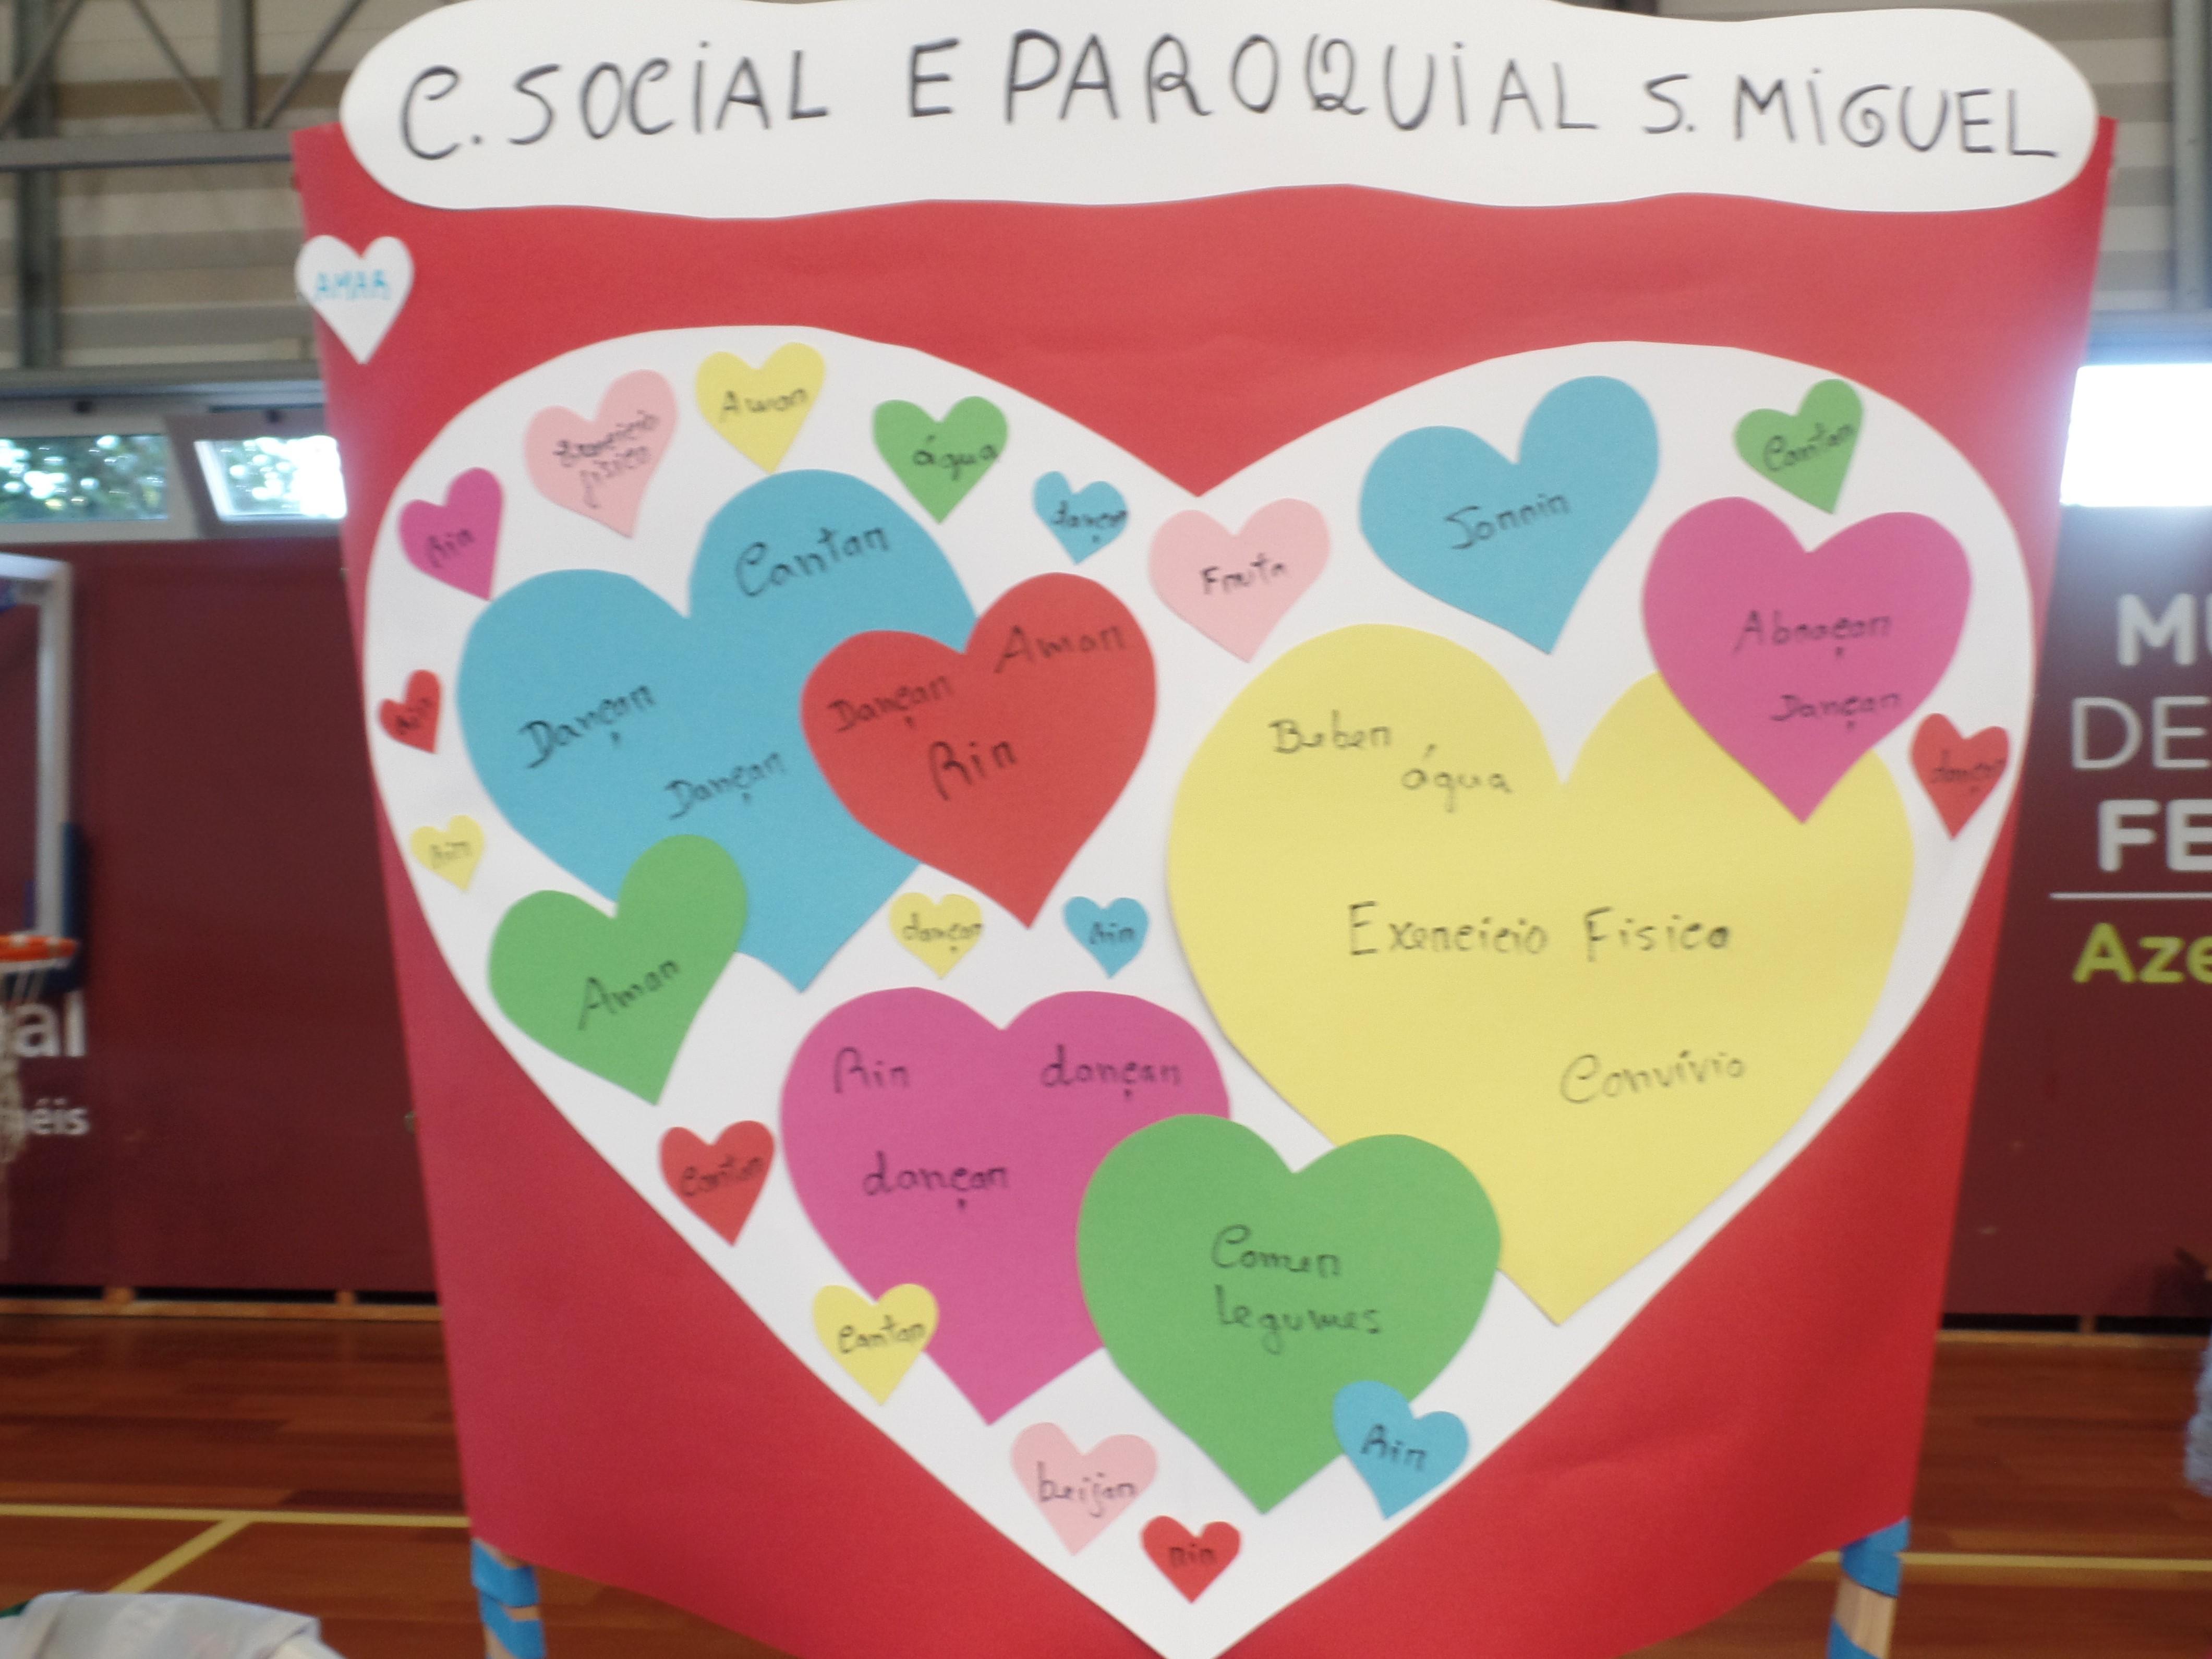 Centro Social e Paroquial S. Miguel